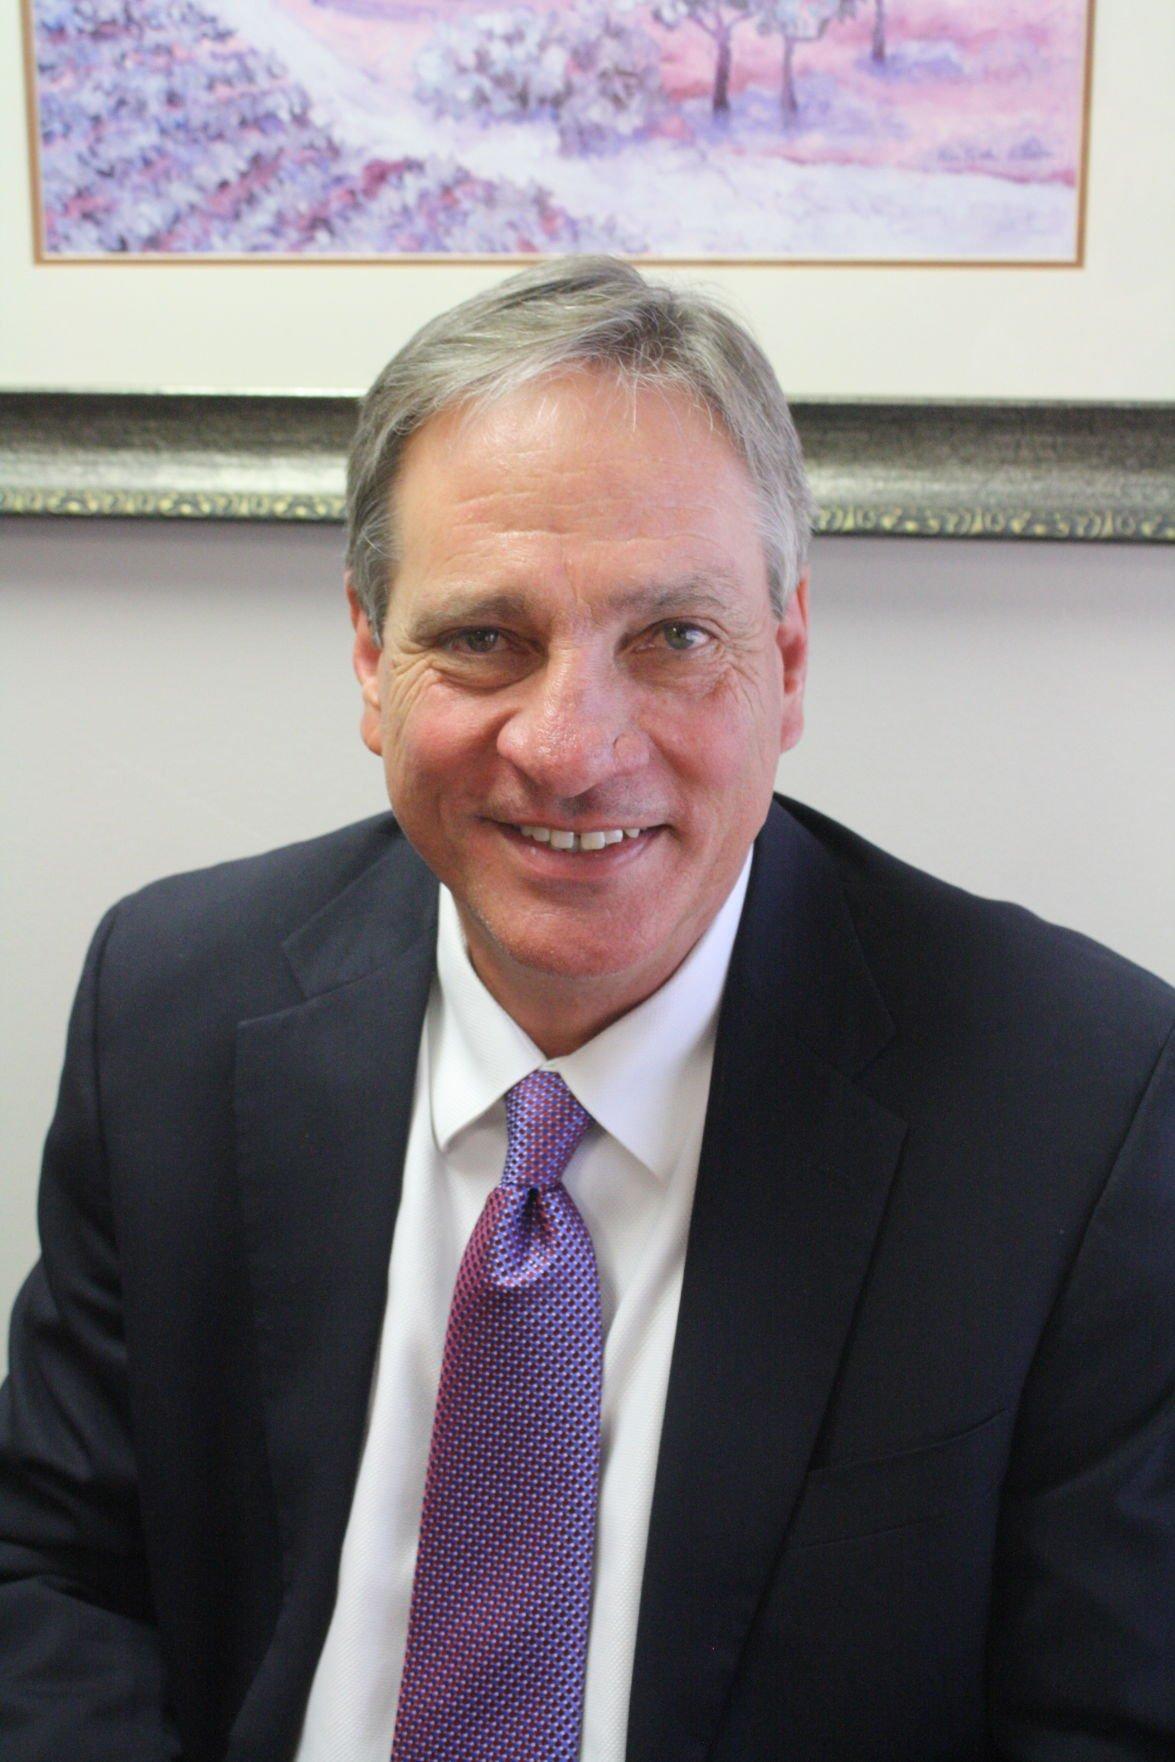 Alan Shubert